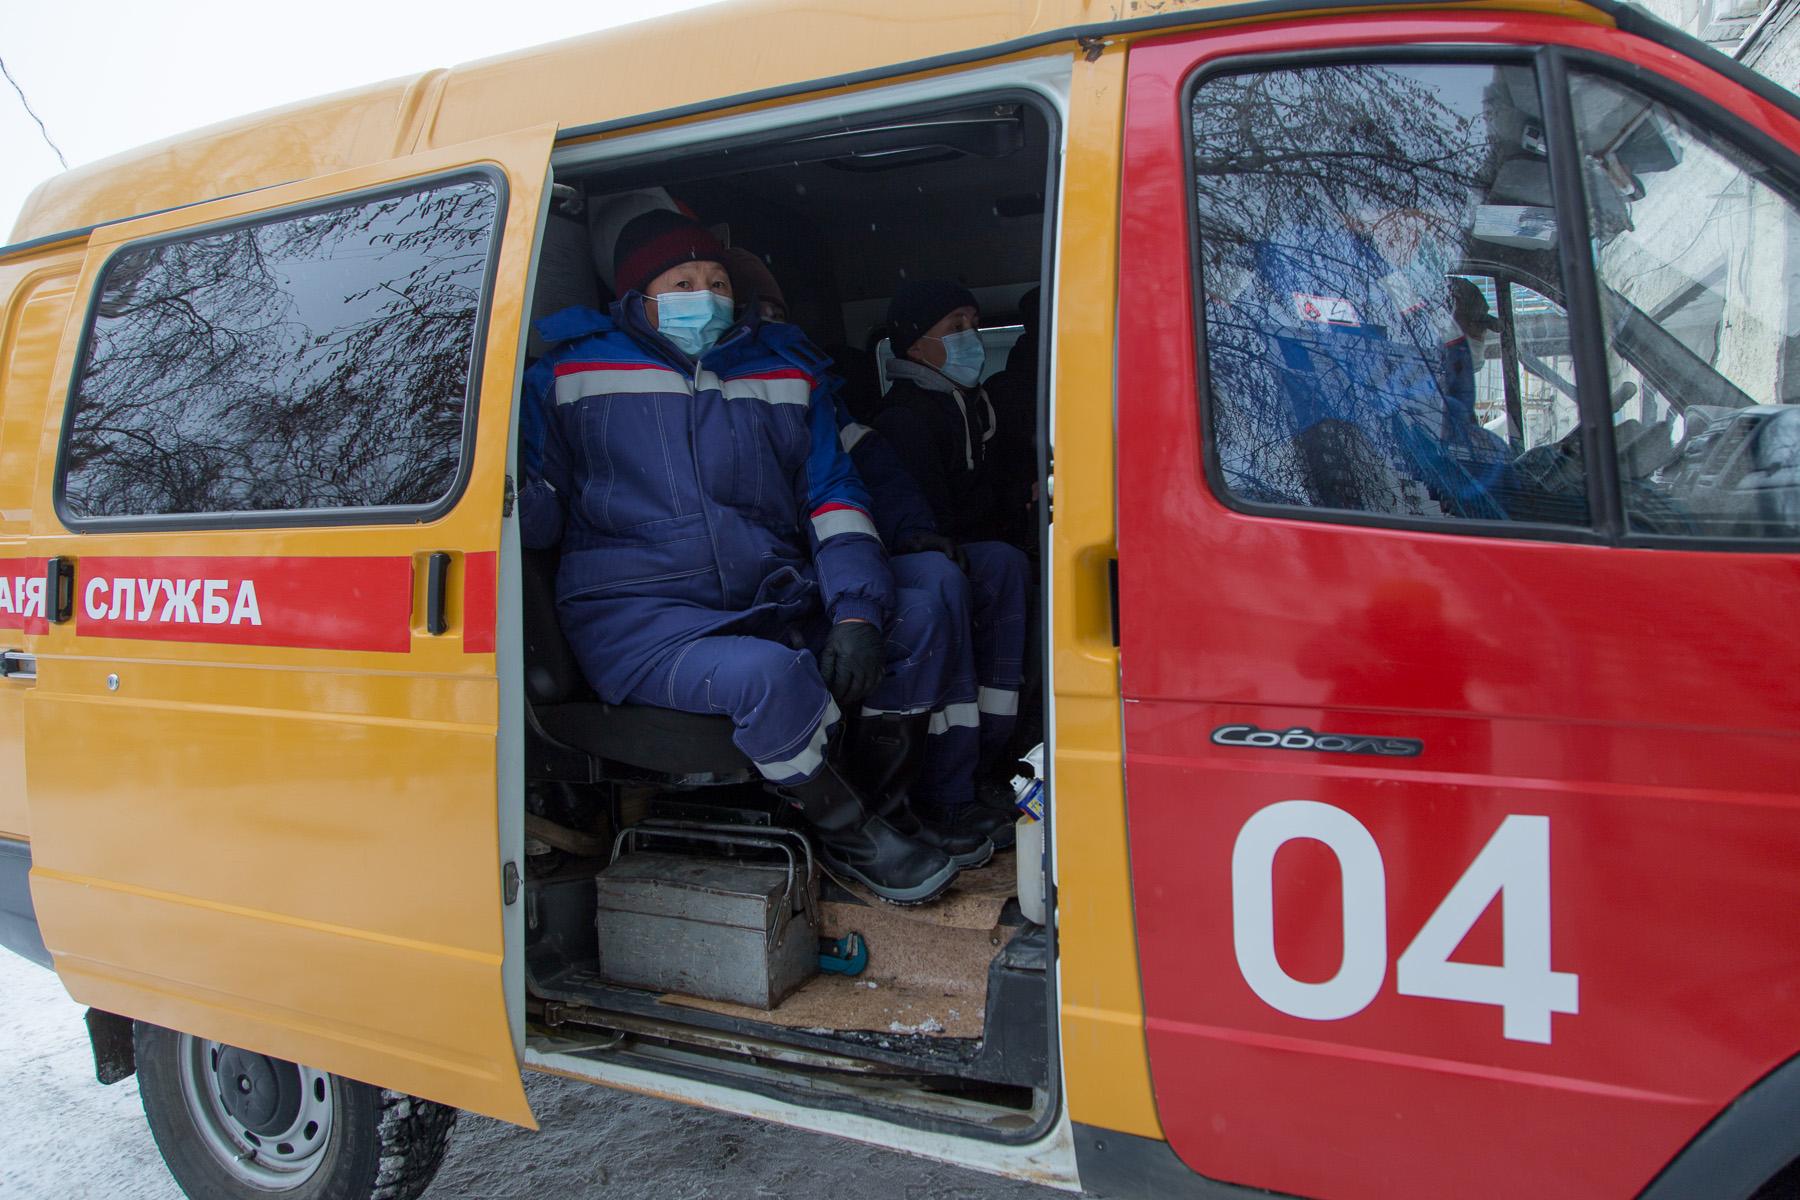 Репортаж ЯСИА: Выезд с газовиками на аварийную заявку в условиях пандемии